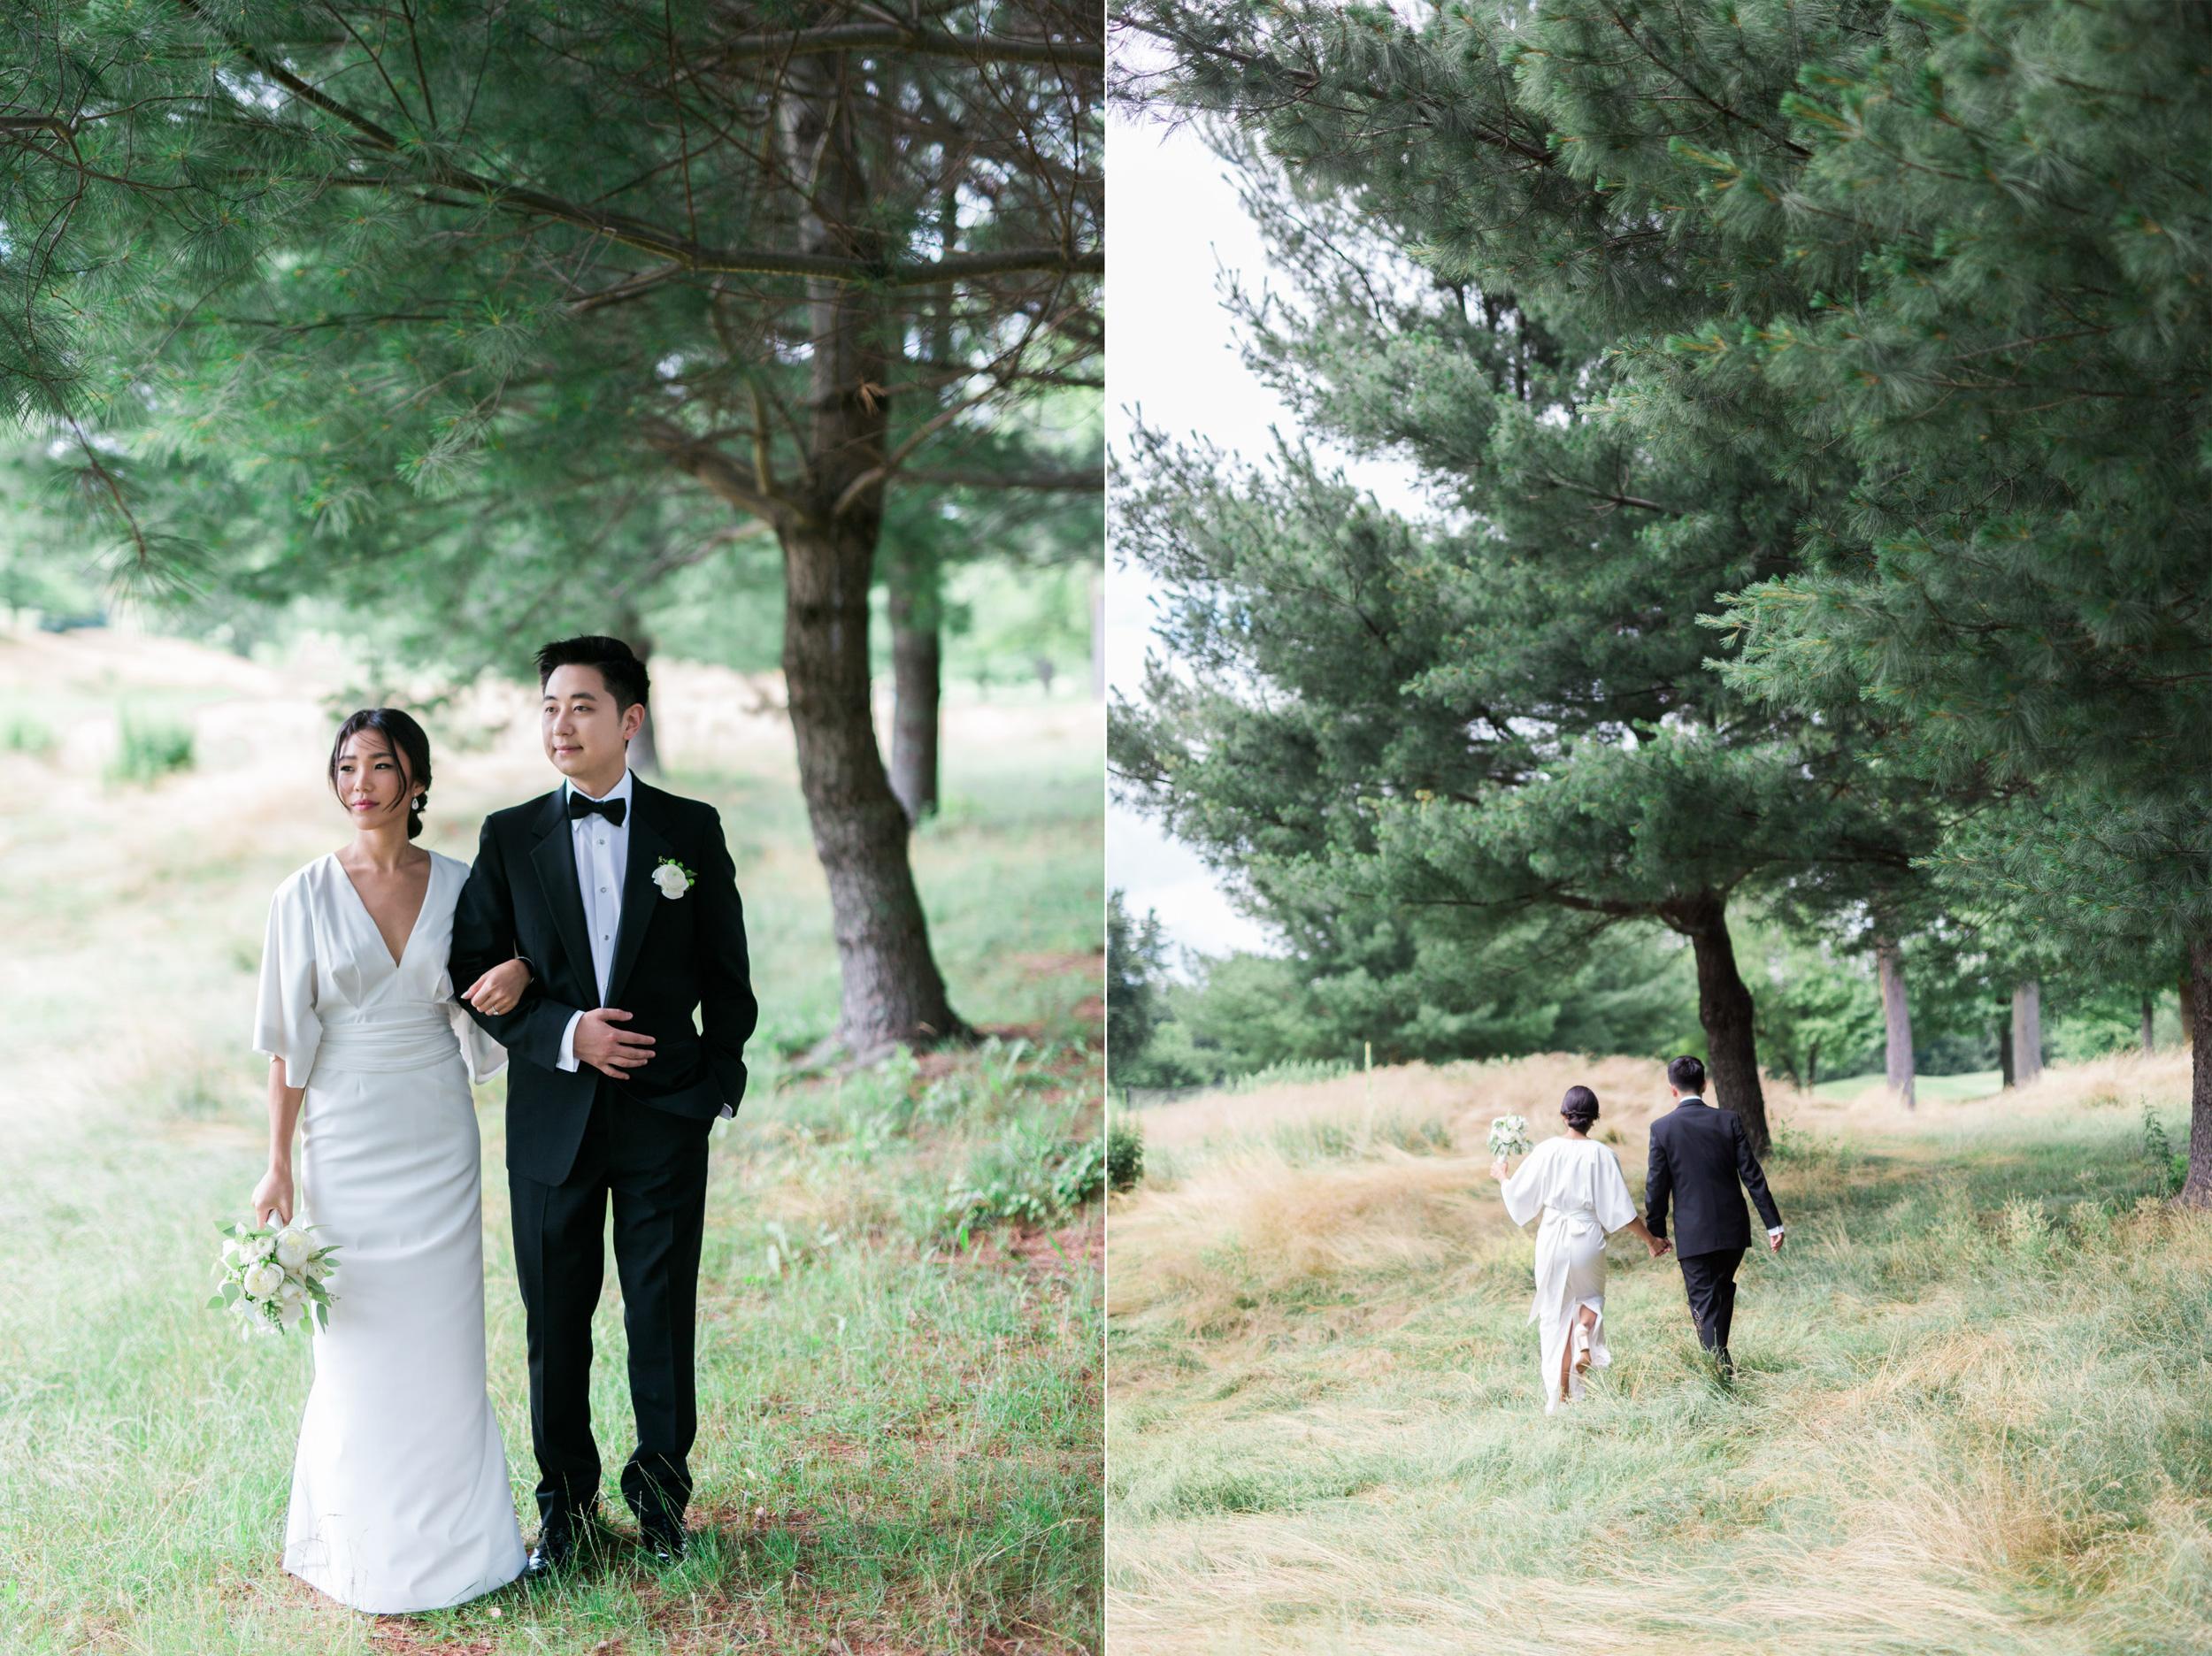 jean-arnold-wedding-0010.jpg